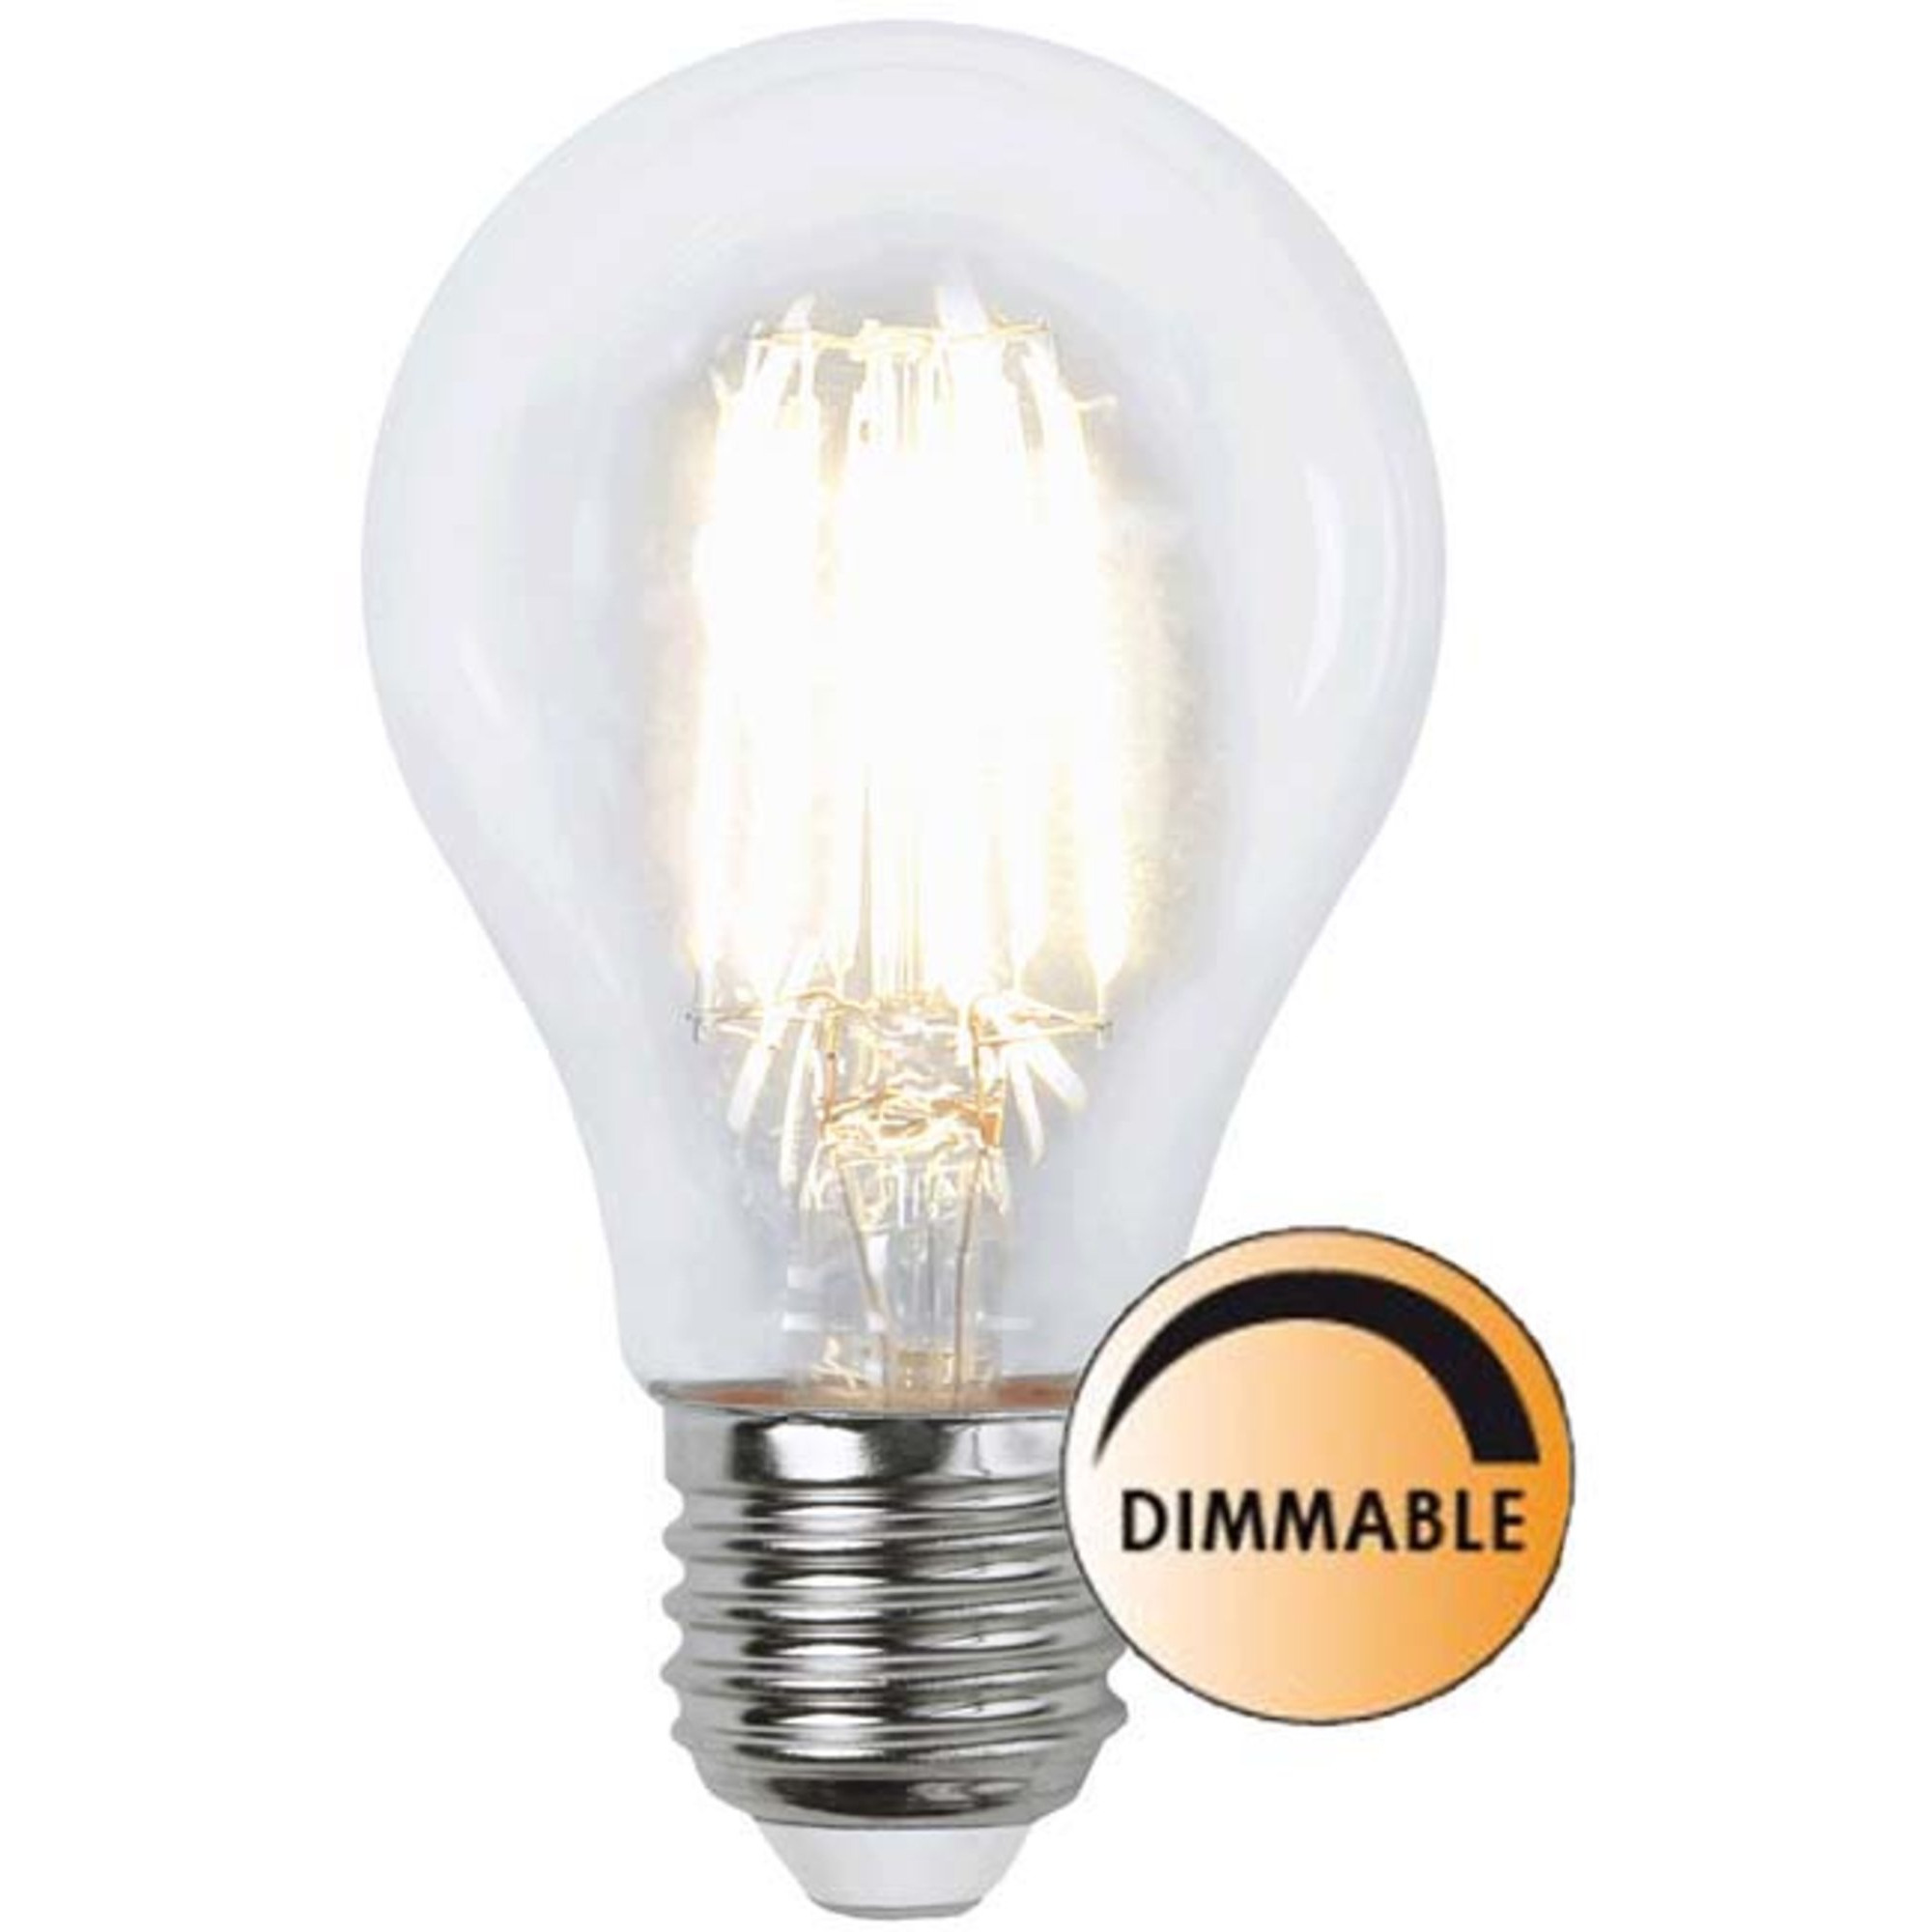 Globen Lighting Ljuskälla LED 352-32 Filament Klar 7 W Dimbar E27 Normal